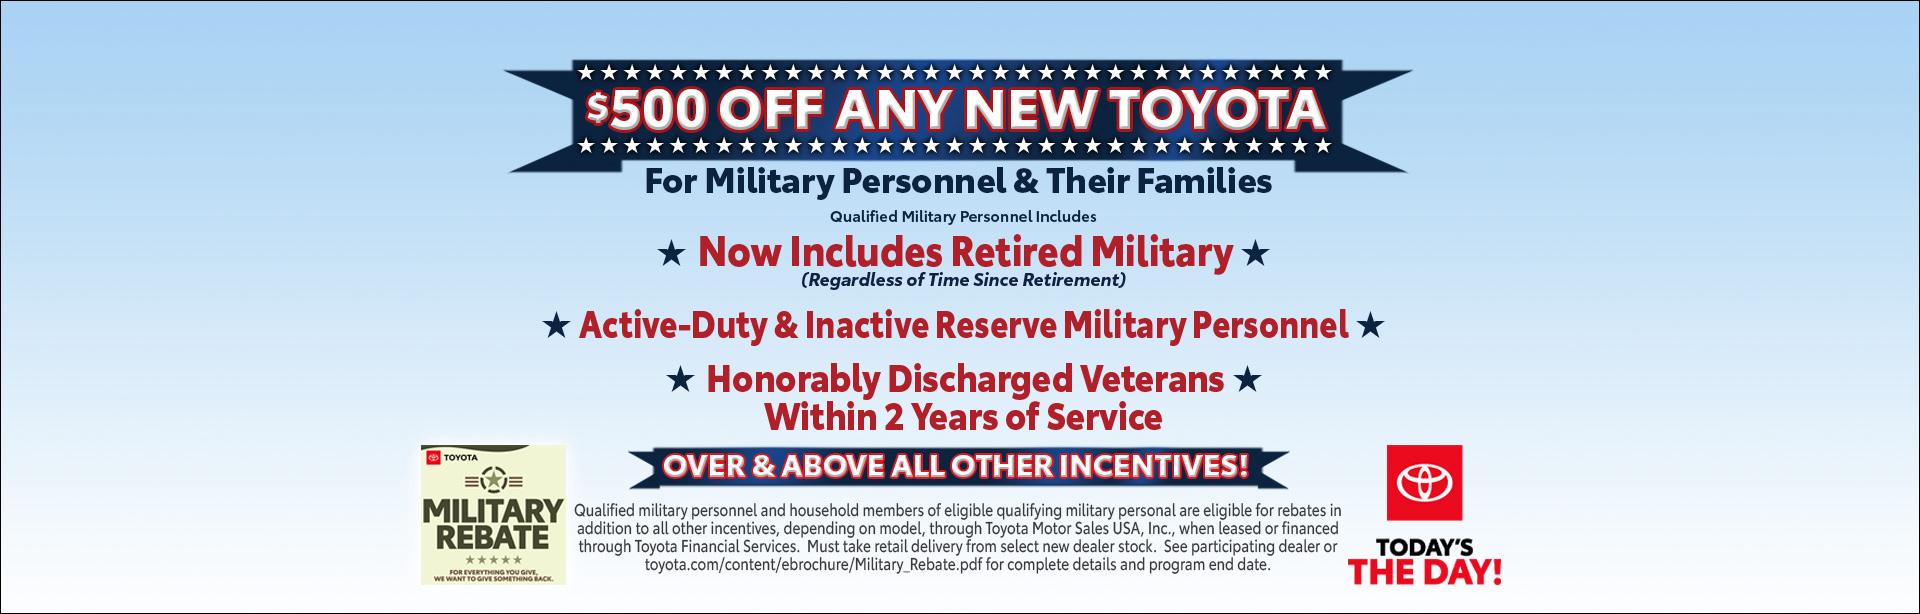 10-20_01_Cincinnati-October-2020-CN-Military-Rebate_1920x614_2af0_All-Models_O_xta.jpeg